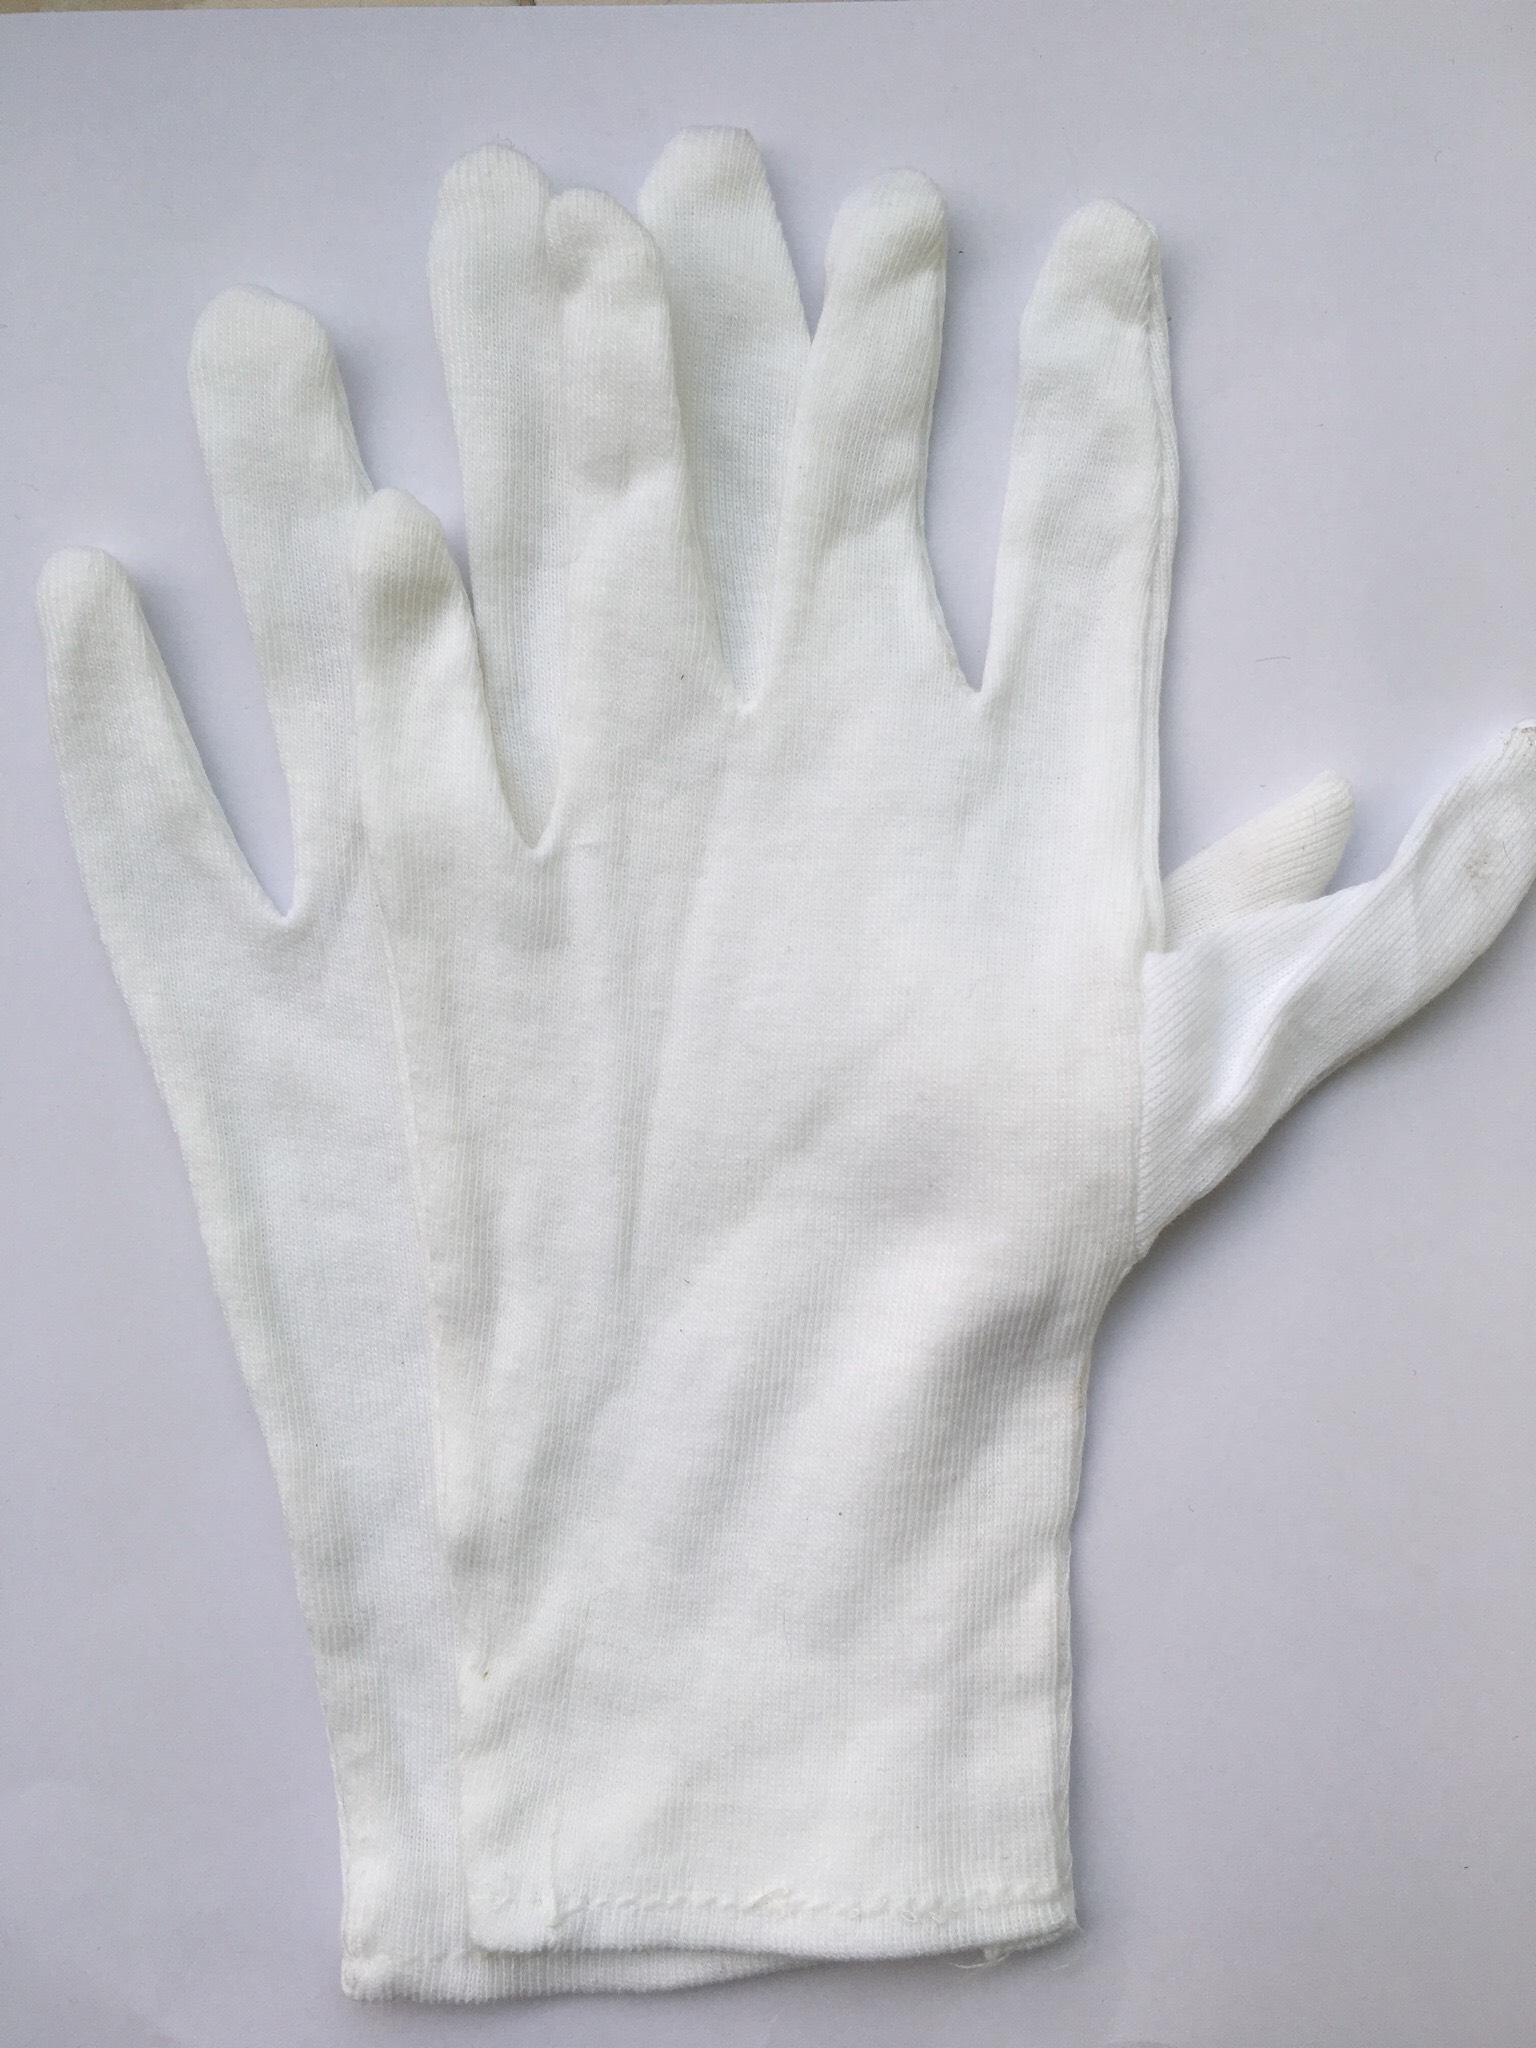 gang-tay-cotton